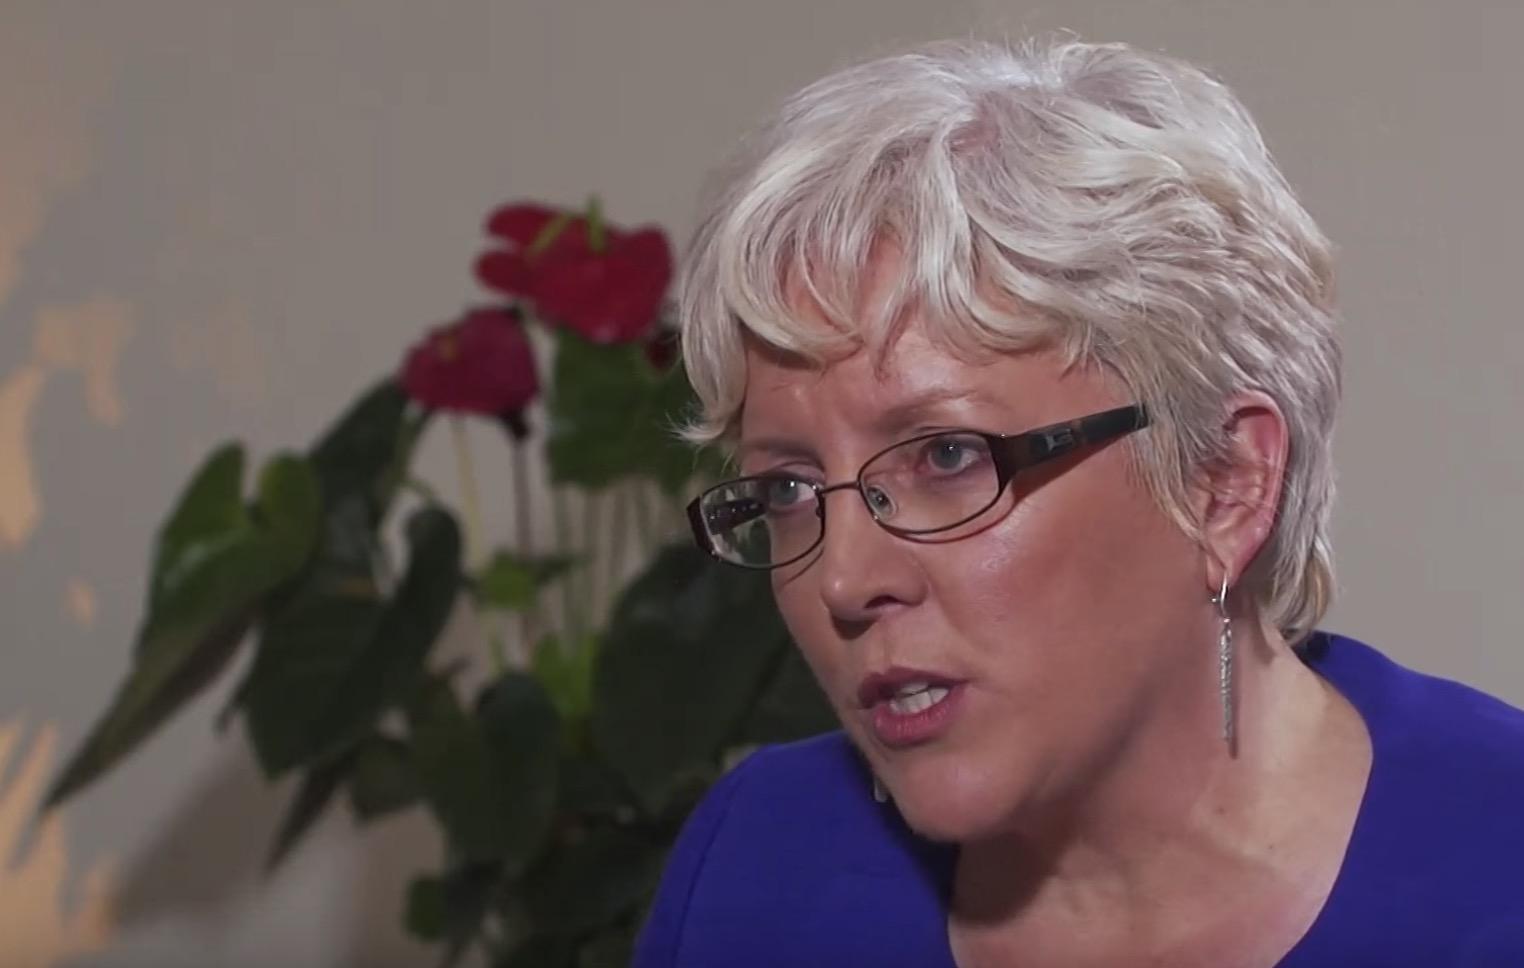 Carrie Gracie (BBC News/YouTube, JG)